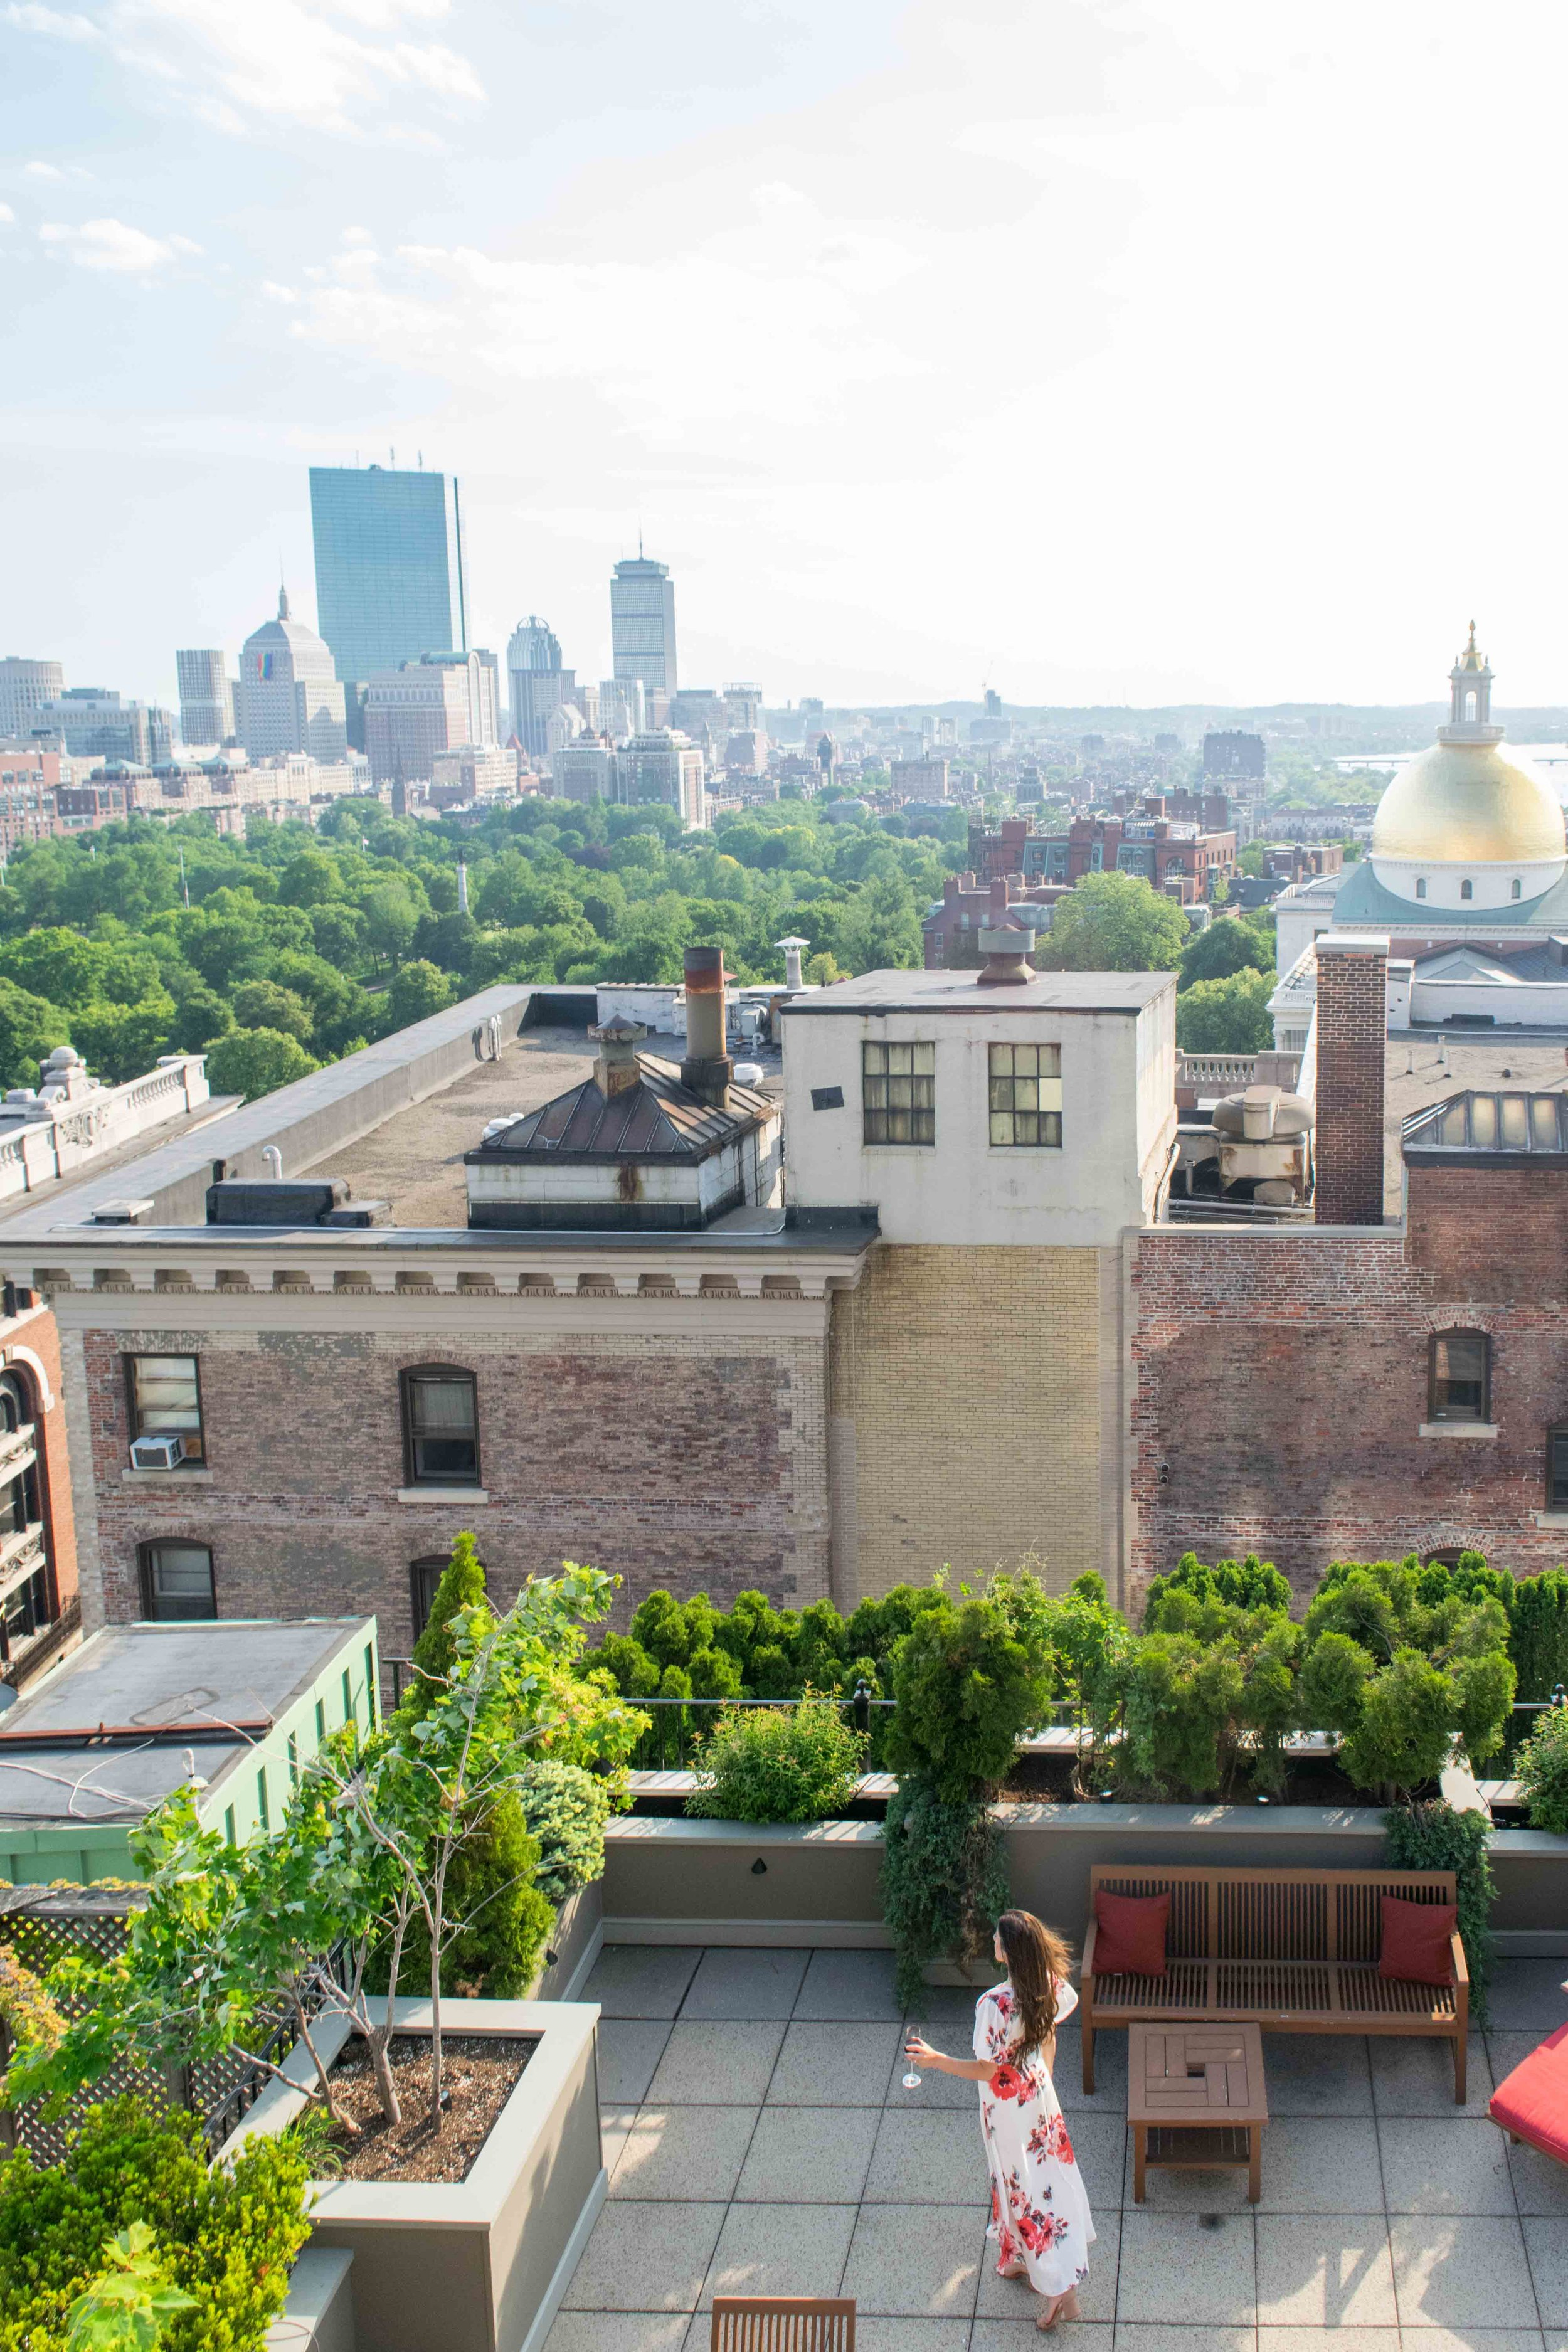 XV-Beacon-Boston-Hotel-5.jpg